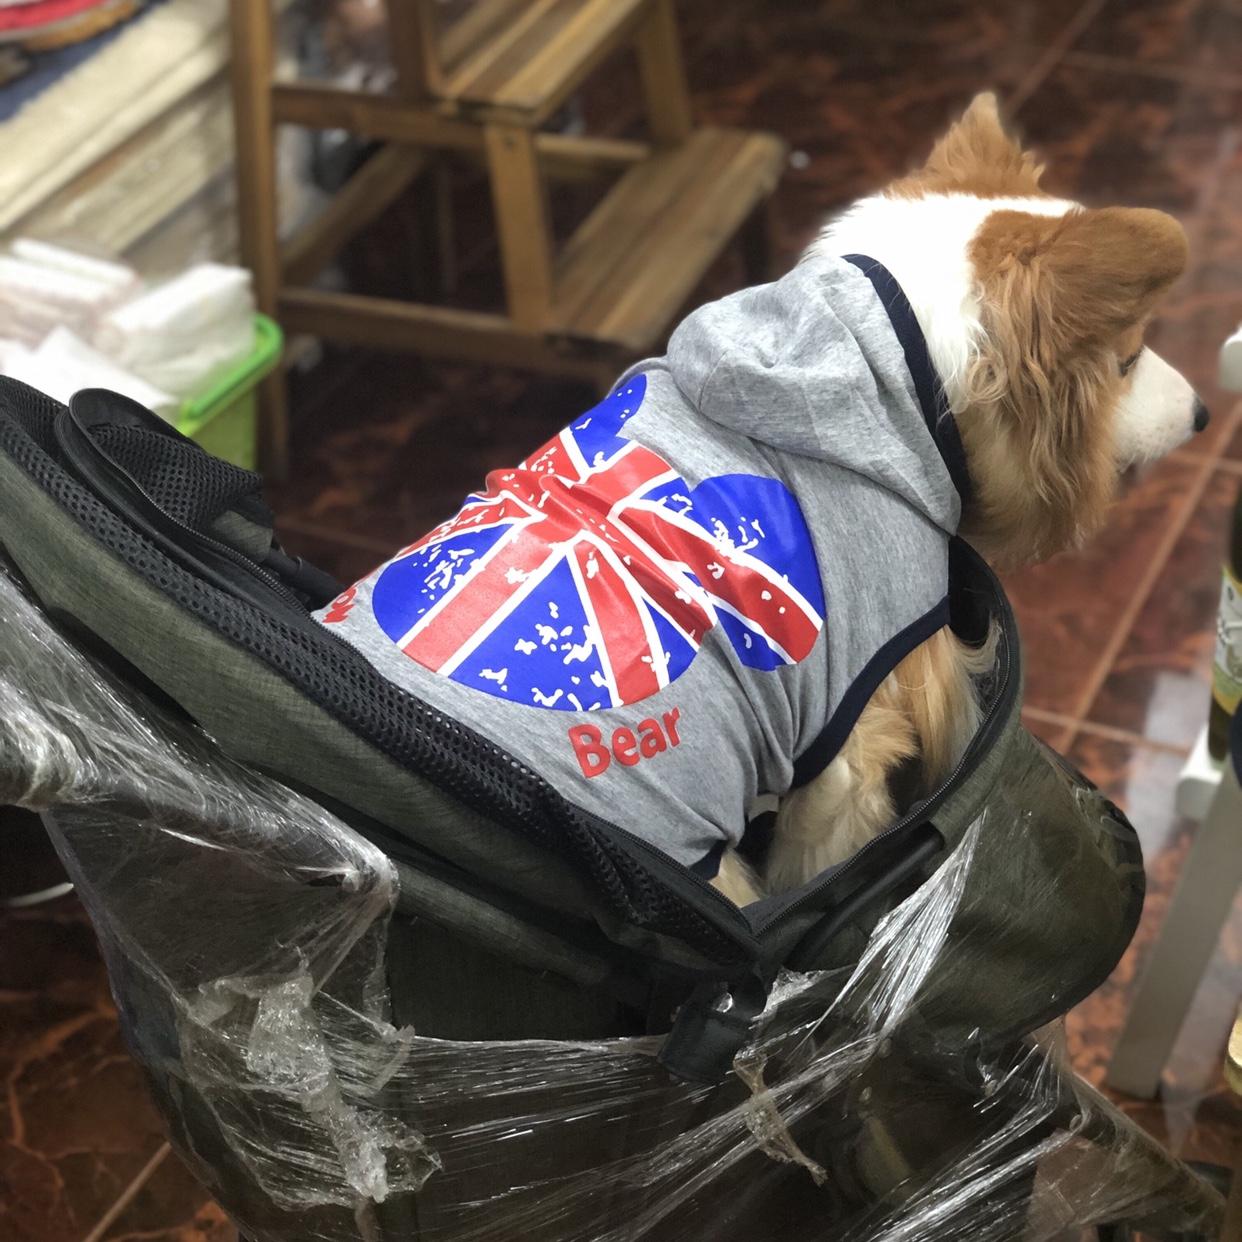 Áo Thun Cờ Anh Có Nón Thái Lan [Size 7 - Size 8] 8kg - 18kg